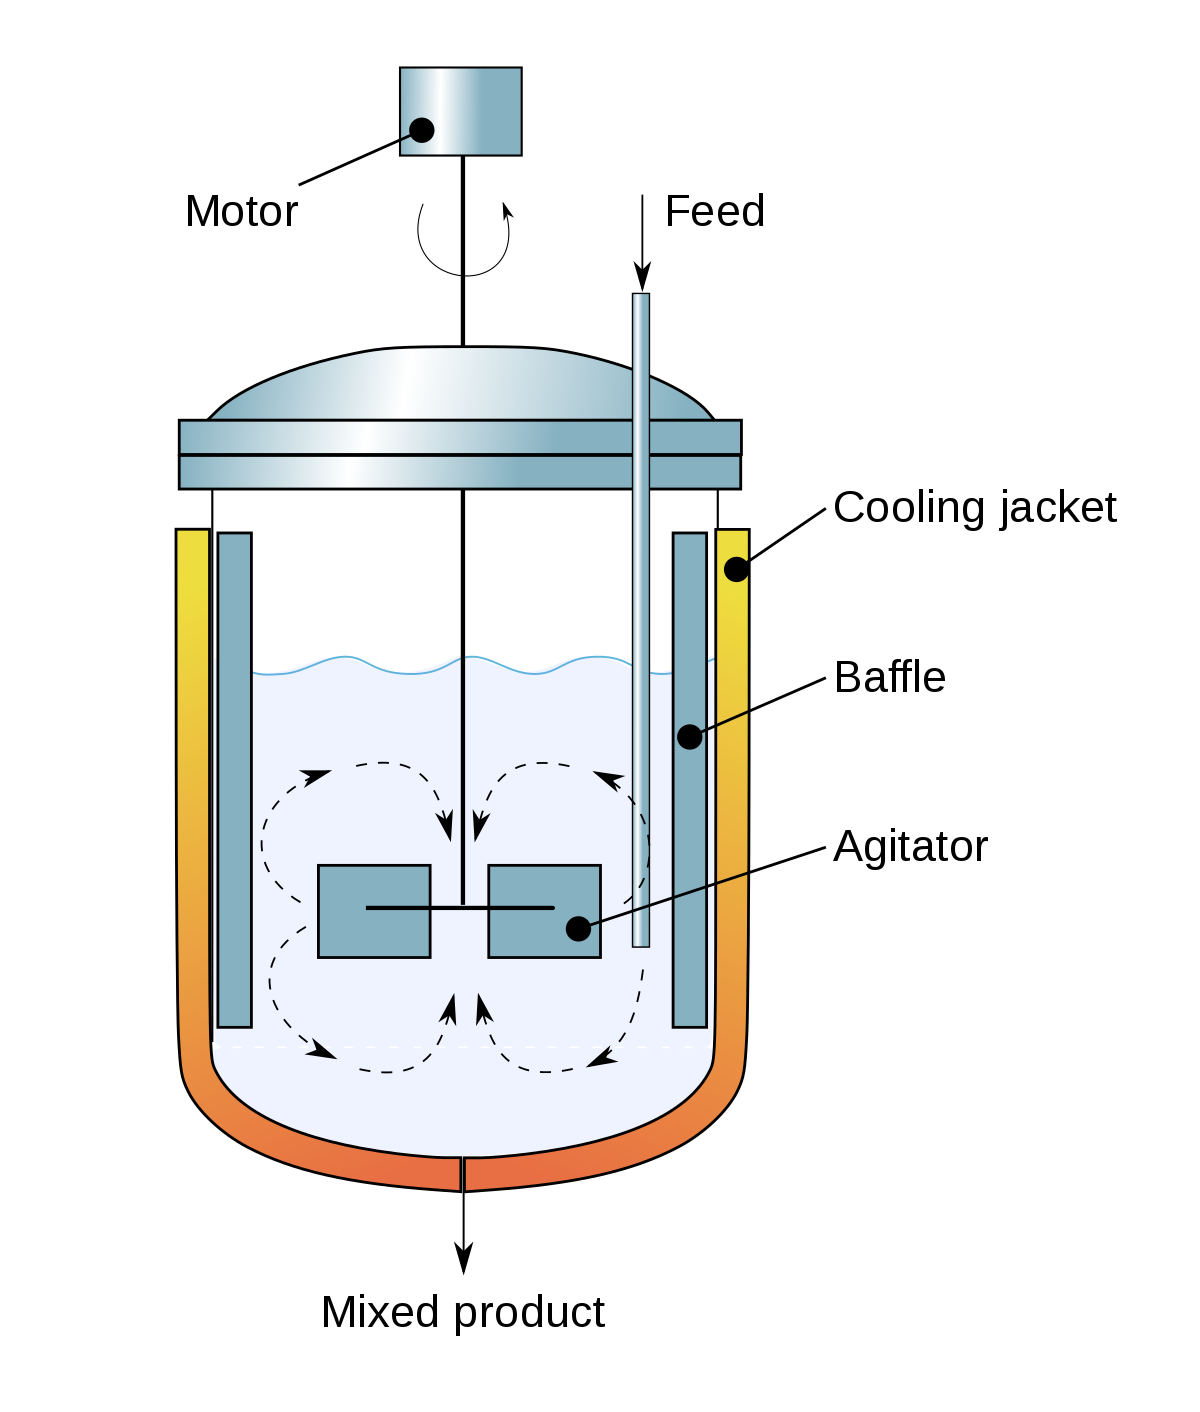 Mixing process engineering wikipedia. Mechanic clipart obeng